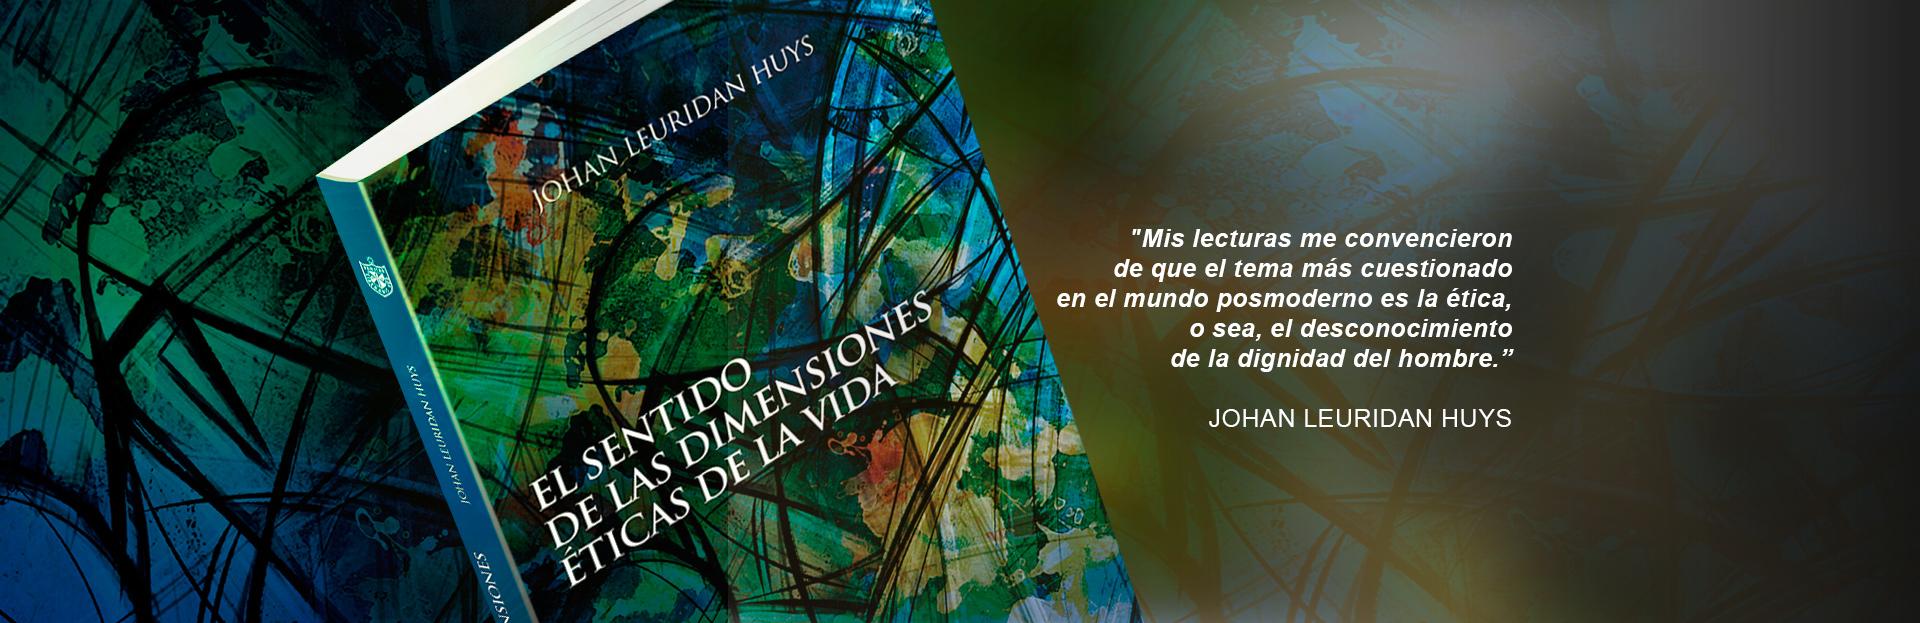 slider-libro-jlh